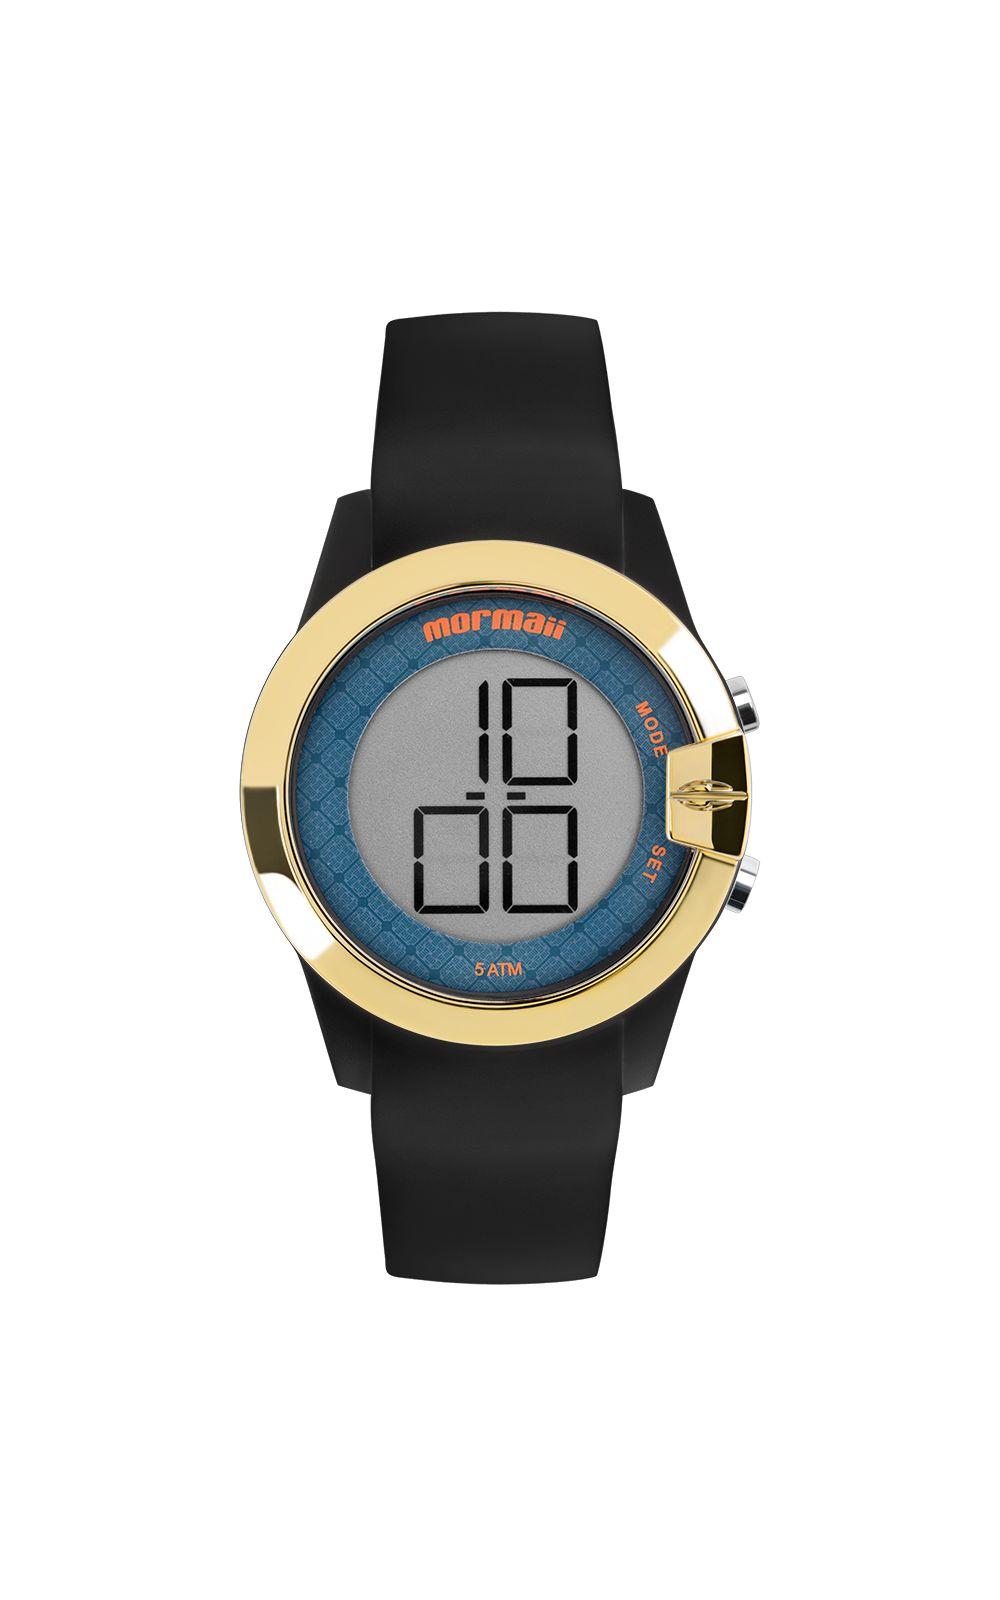 d91b767854f Relógio Mormaii Feminino Luau Dourado - MO13001 8A. undefined